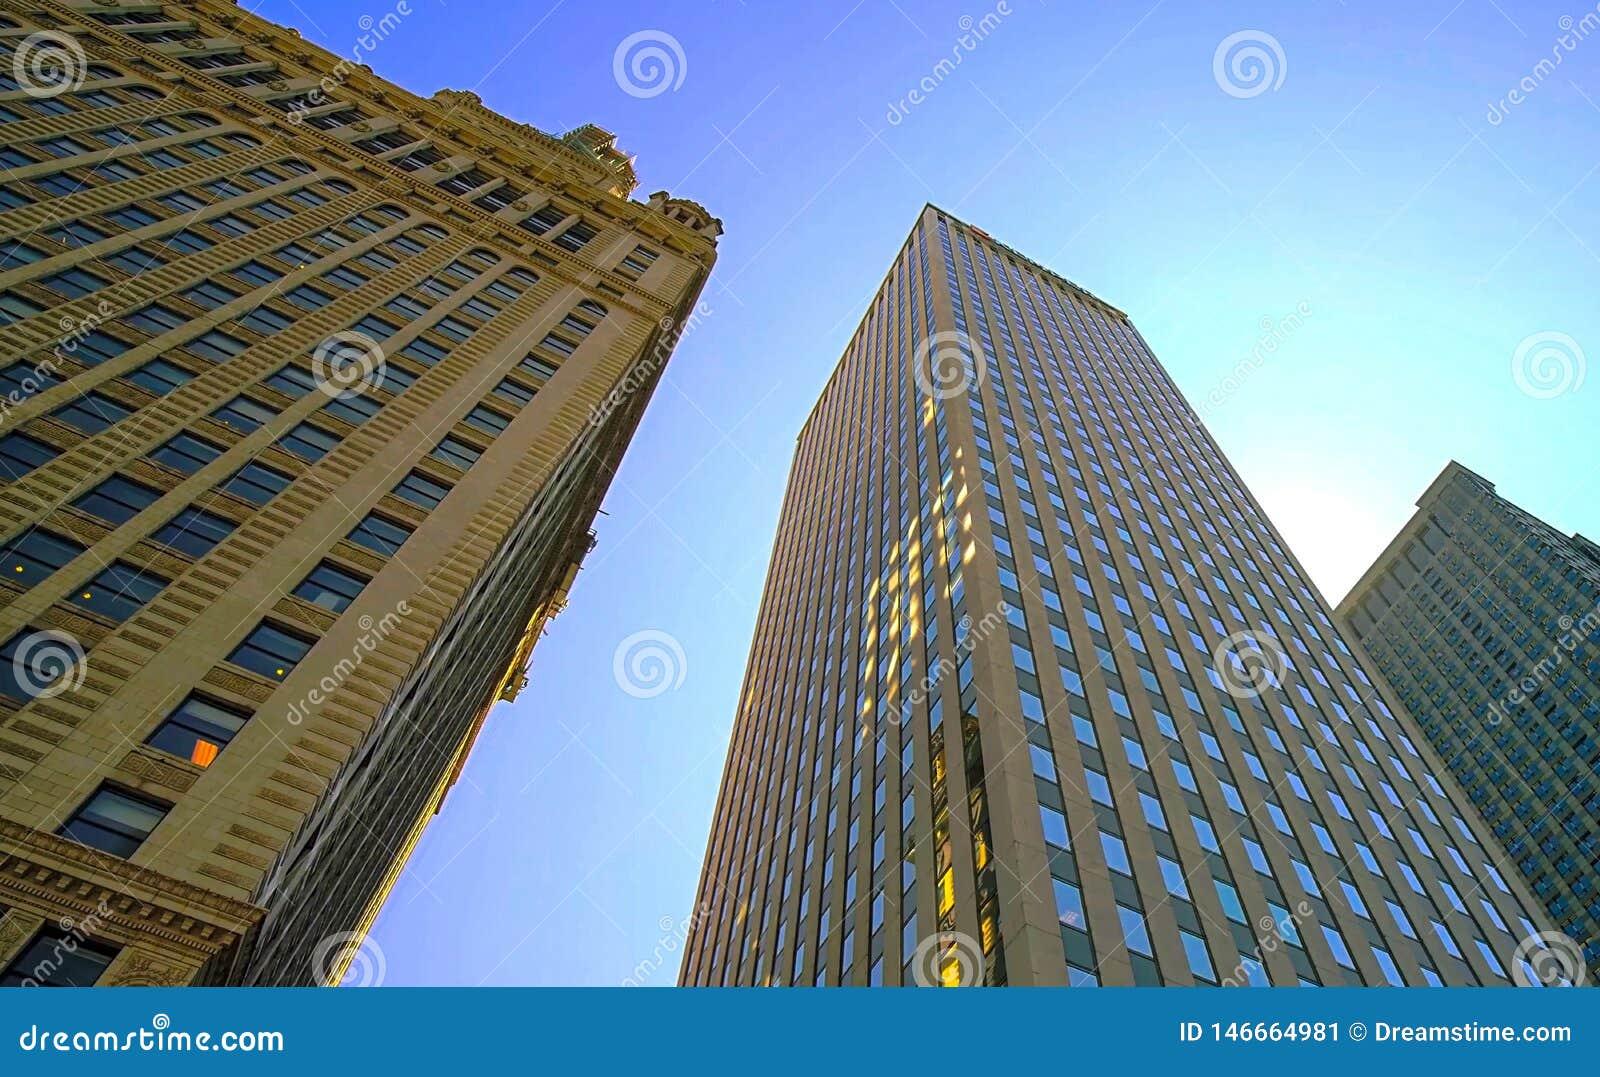 Achtergrond, wolkenkrabbers tegen de blauwe hemel